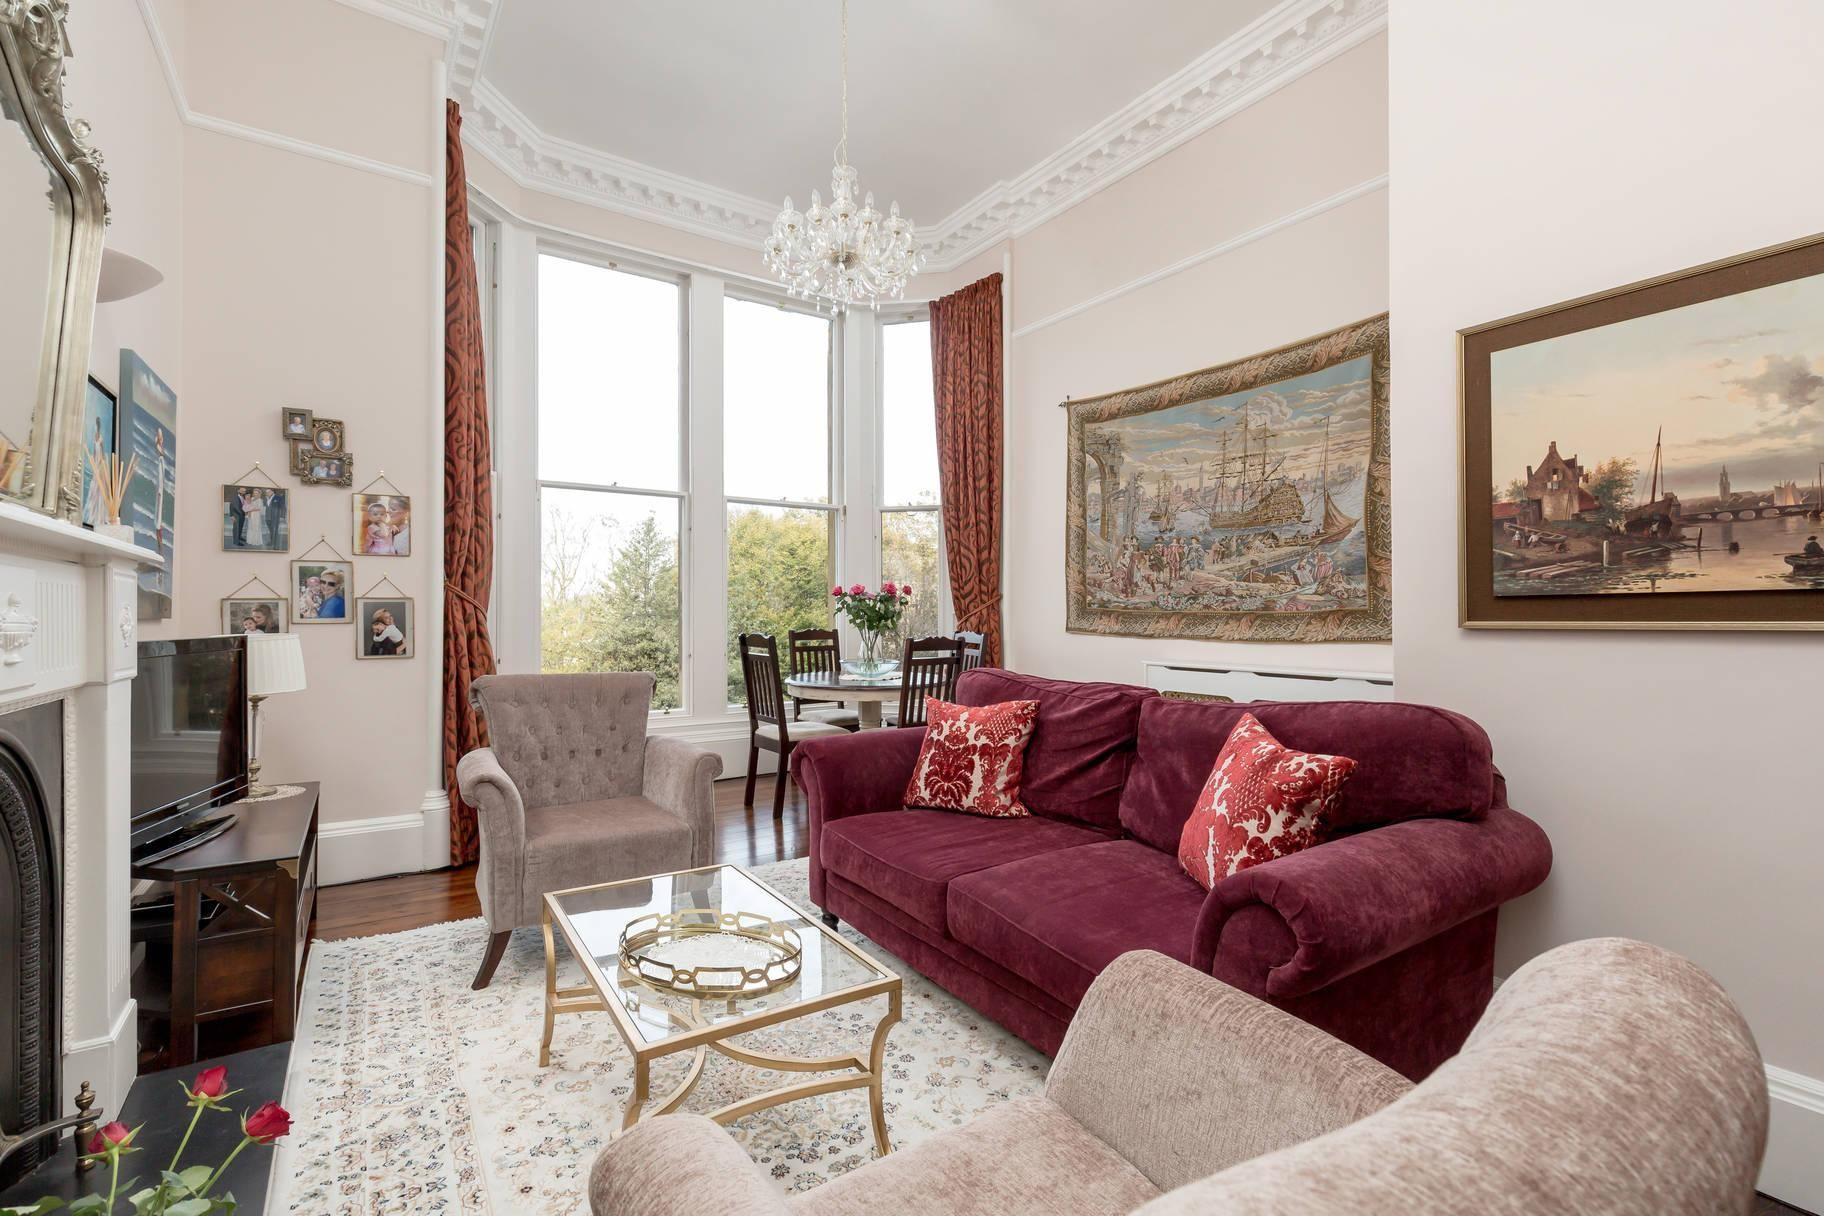 23/1 Buckingham Terrace, West End - Photo 2